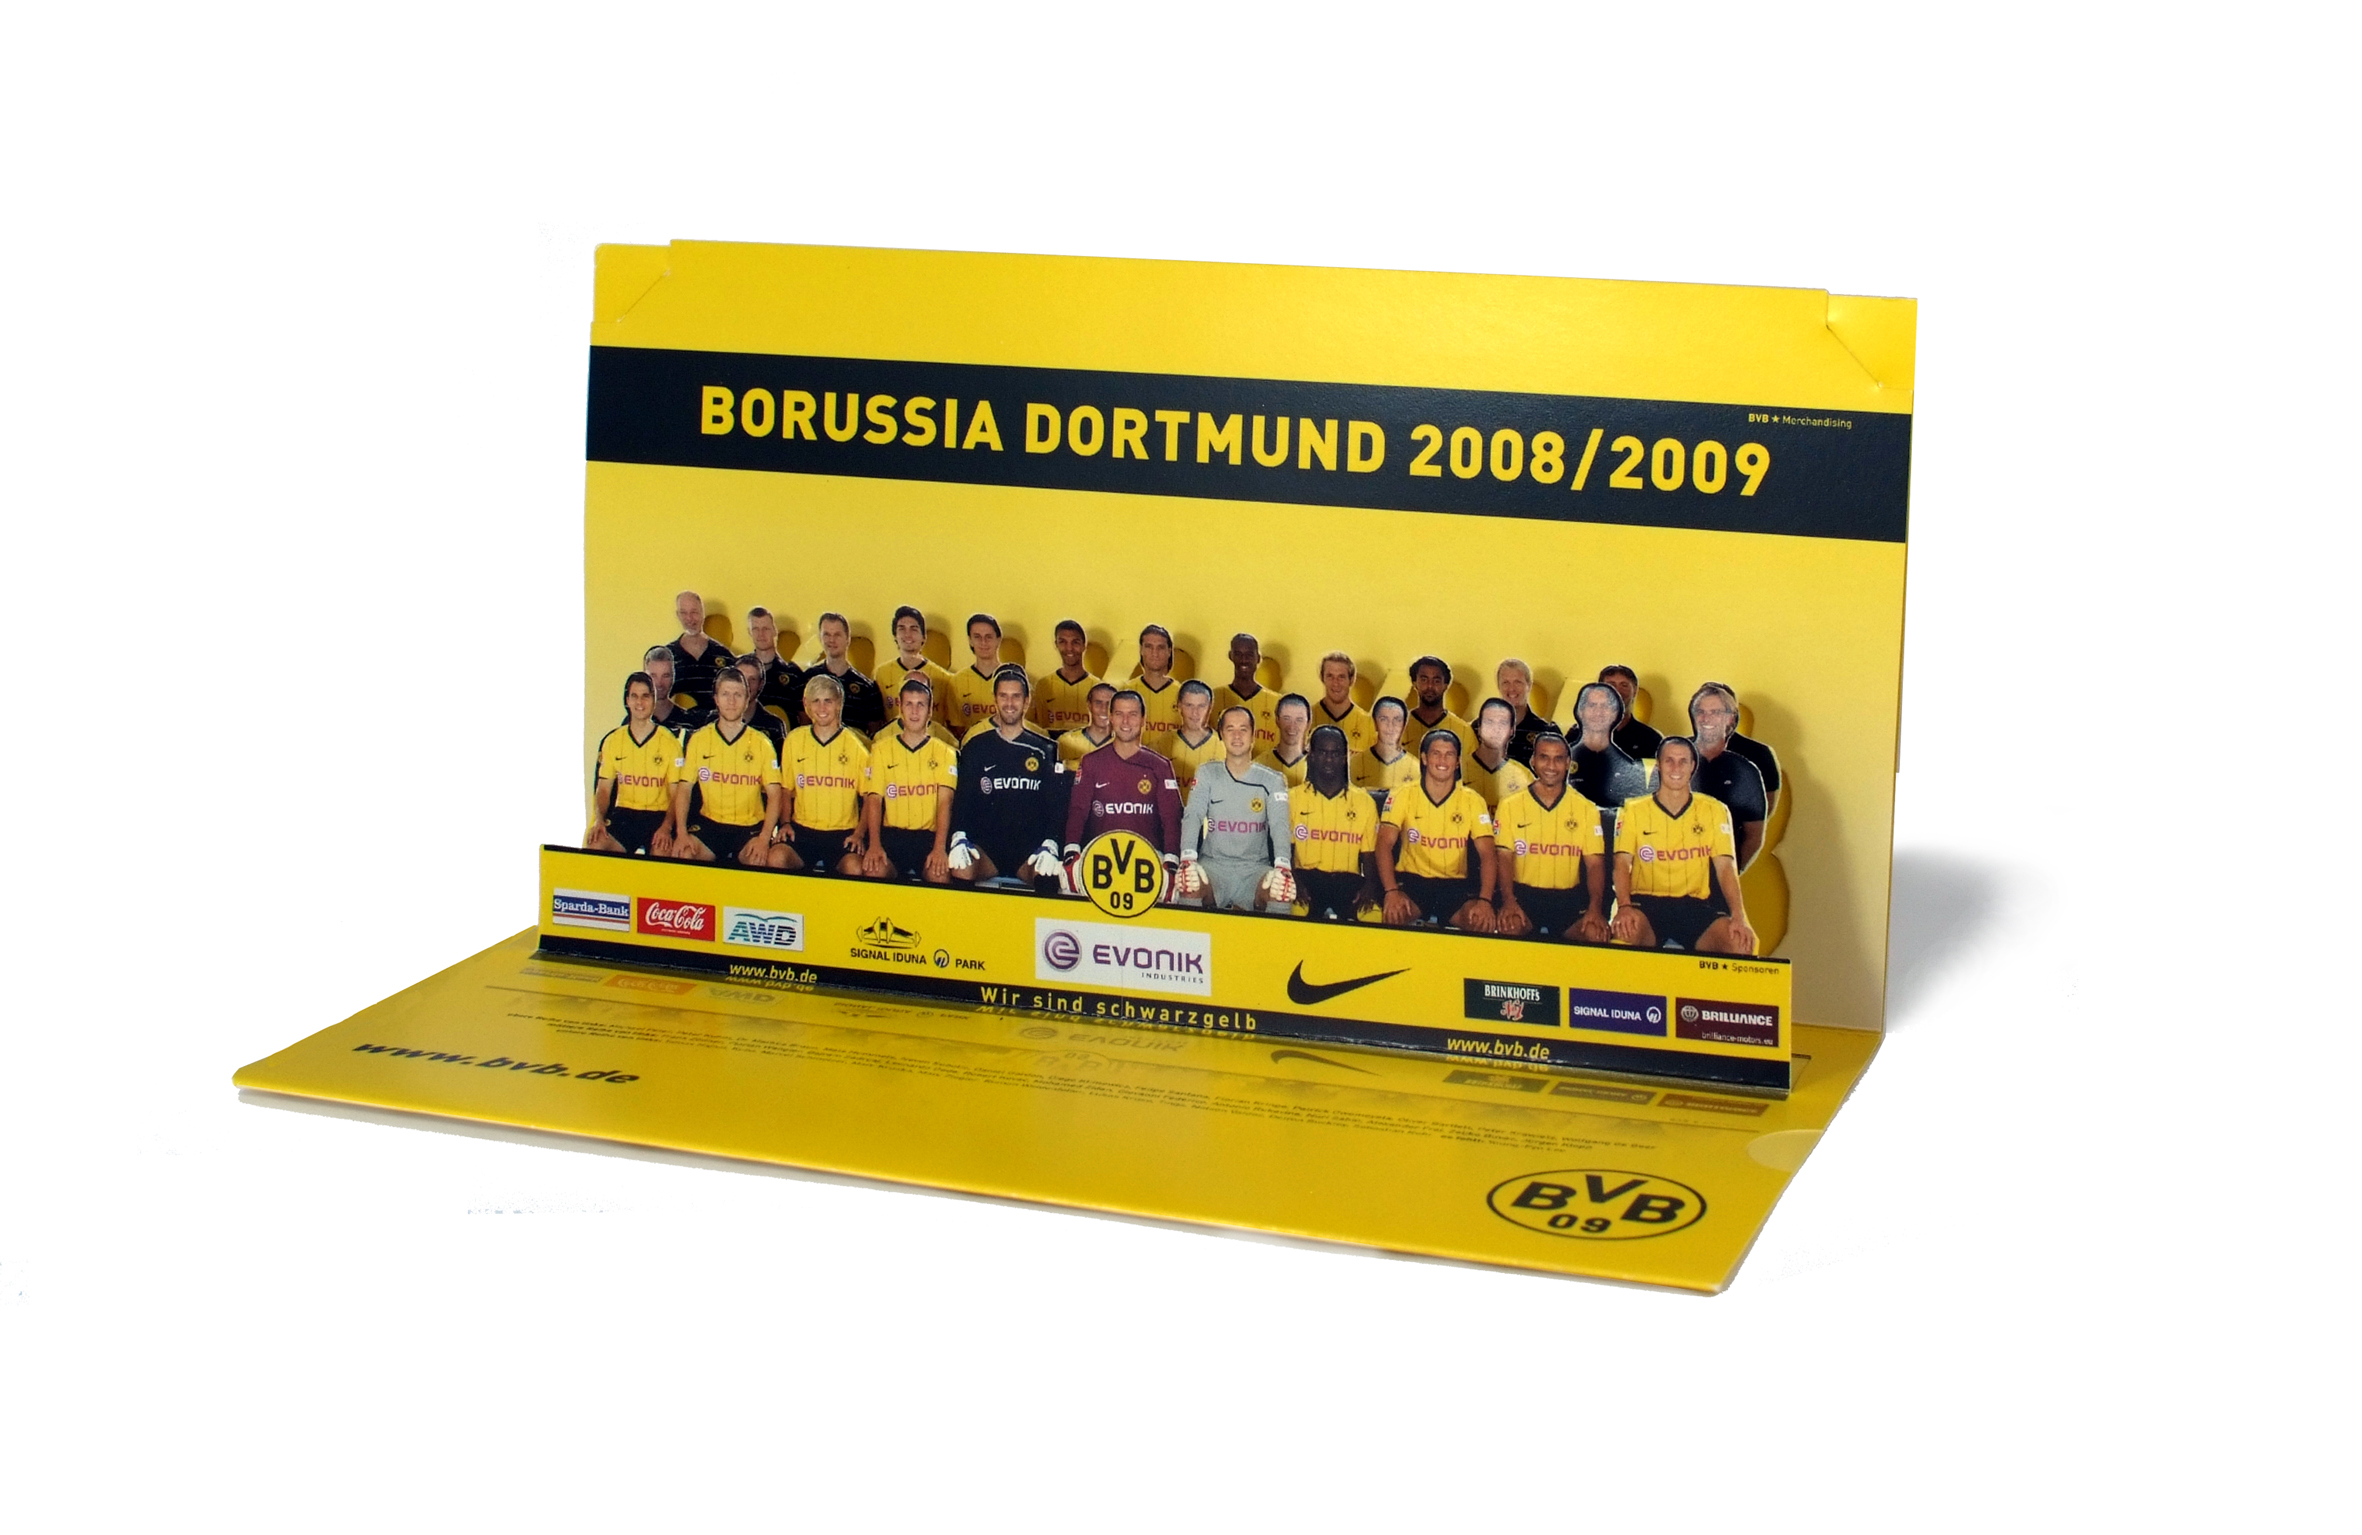 bvb team 2008